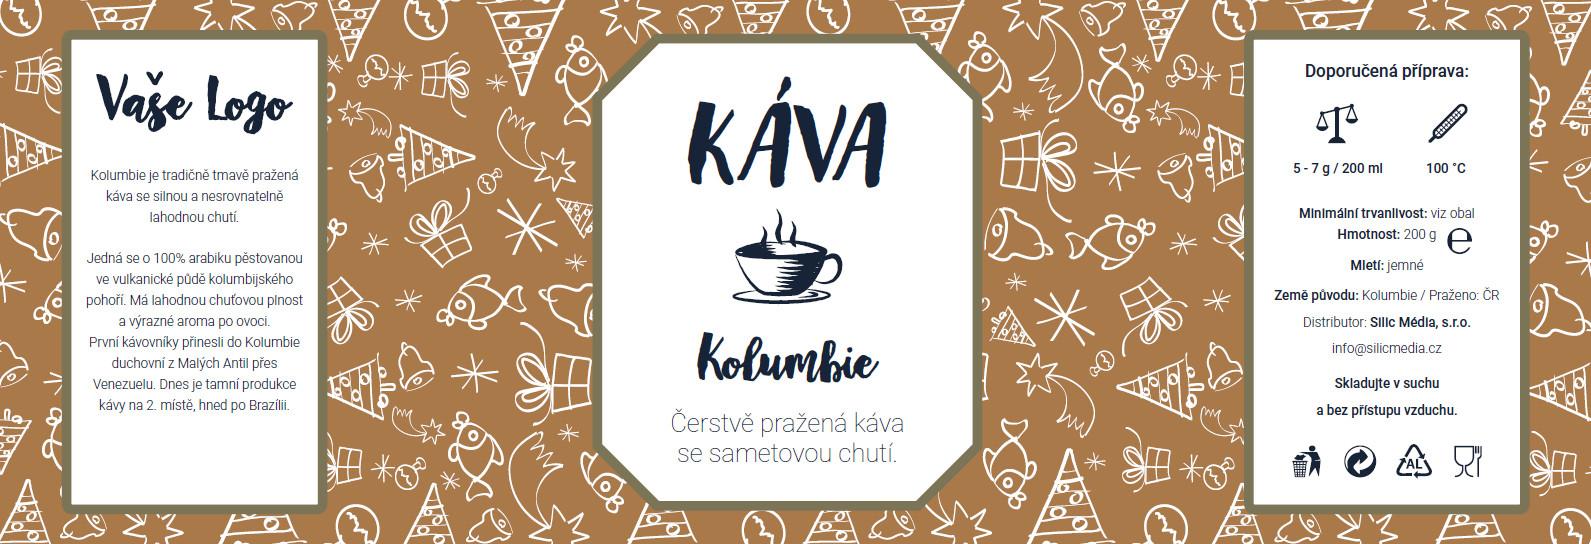 Reklamní káva Kolumbie